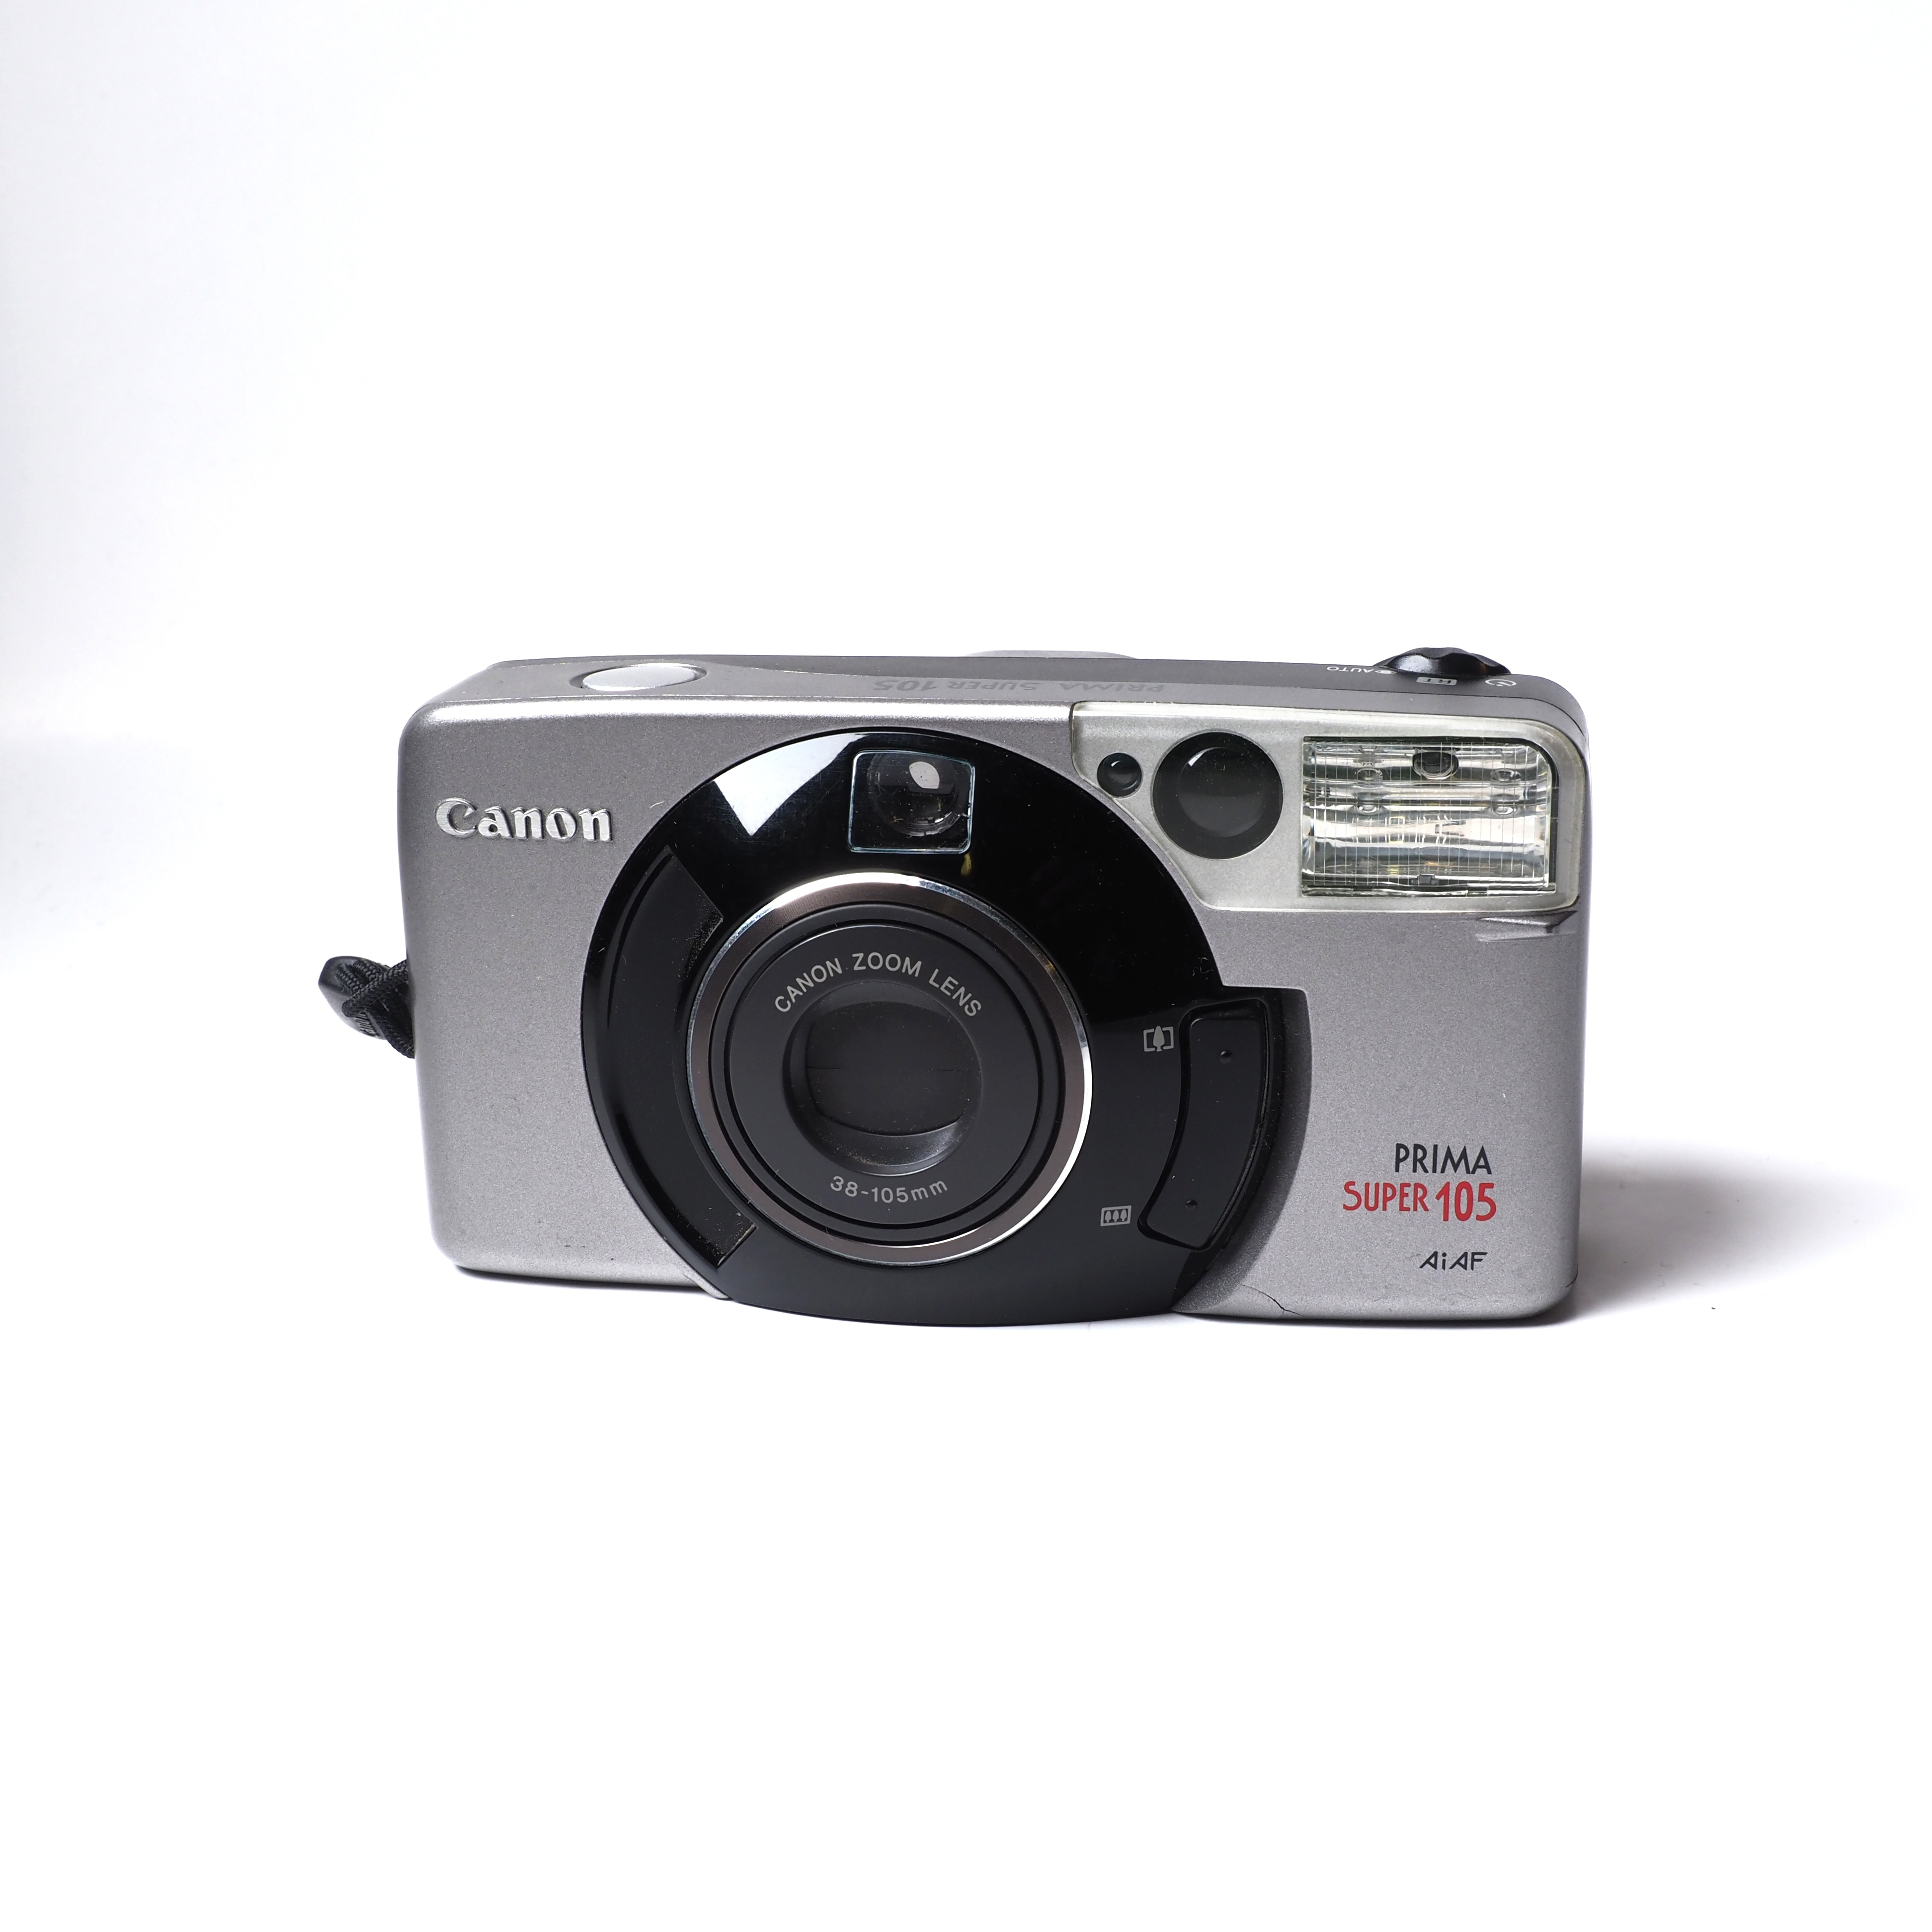 Canon Prima Super 105 AF - Begagnat